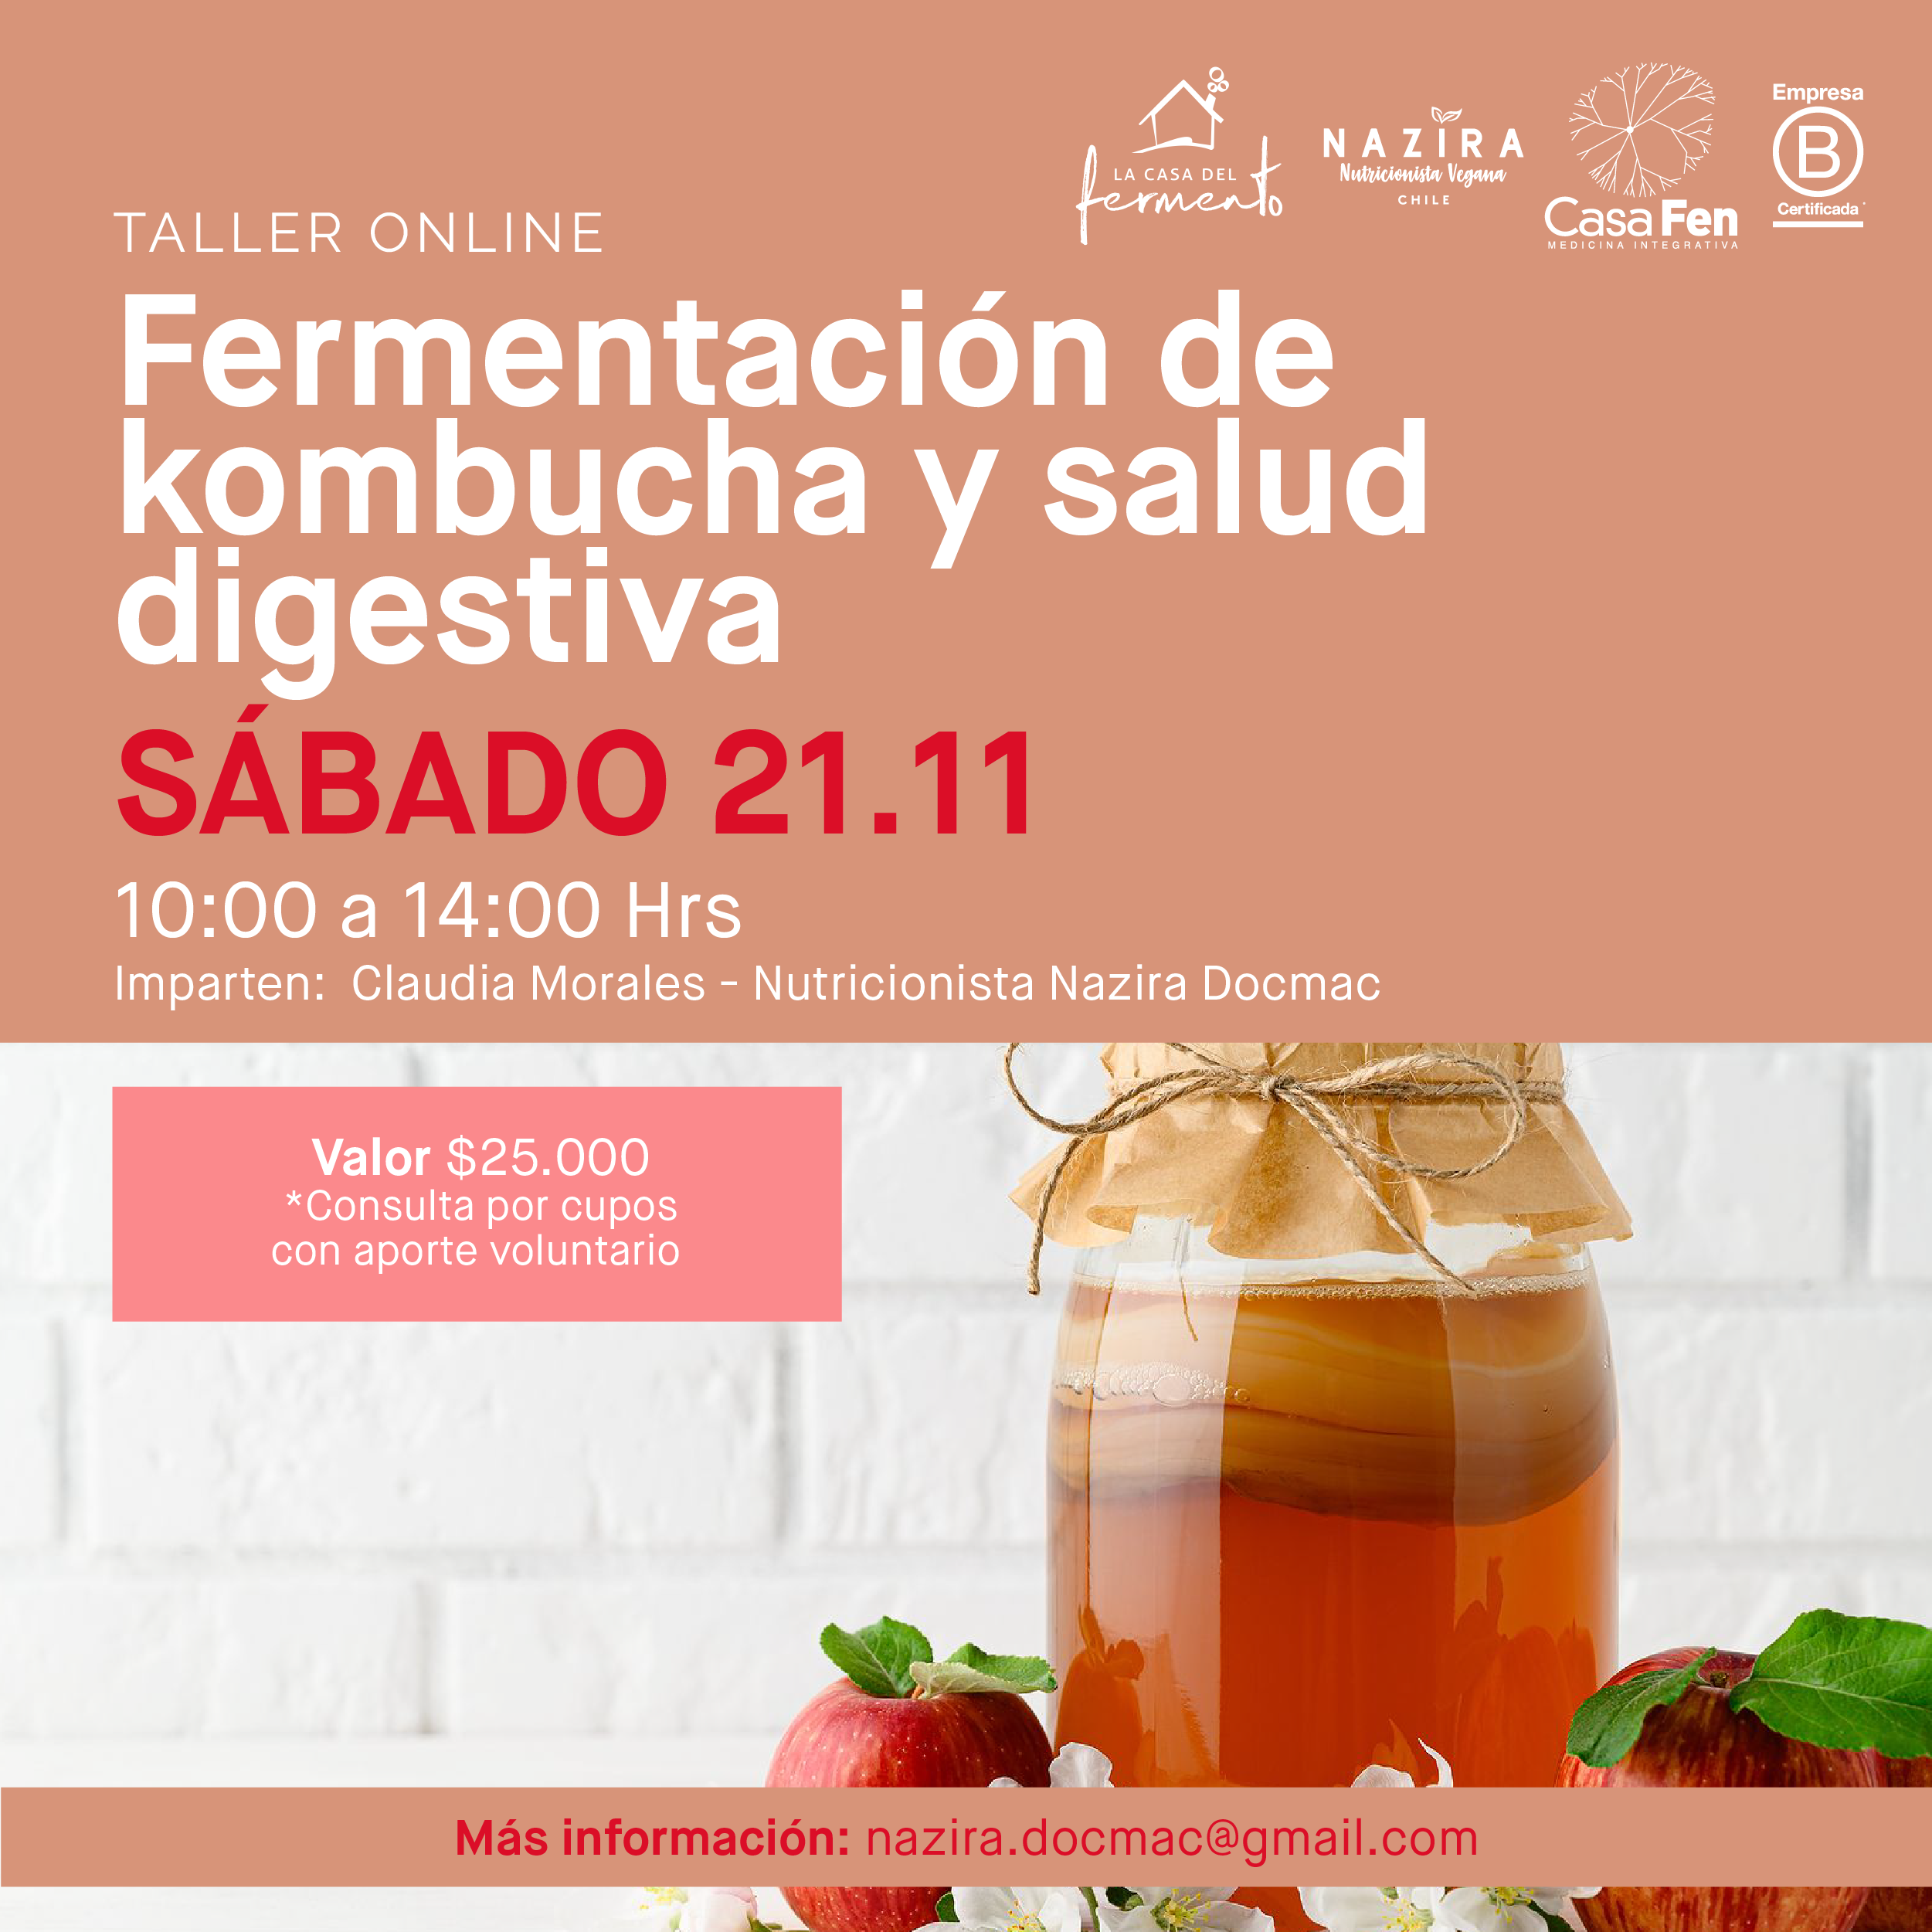 Taller online Fermentación de kombucha y salud digestiva-CasaFen